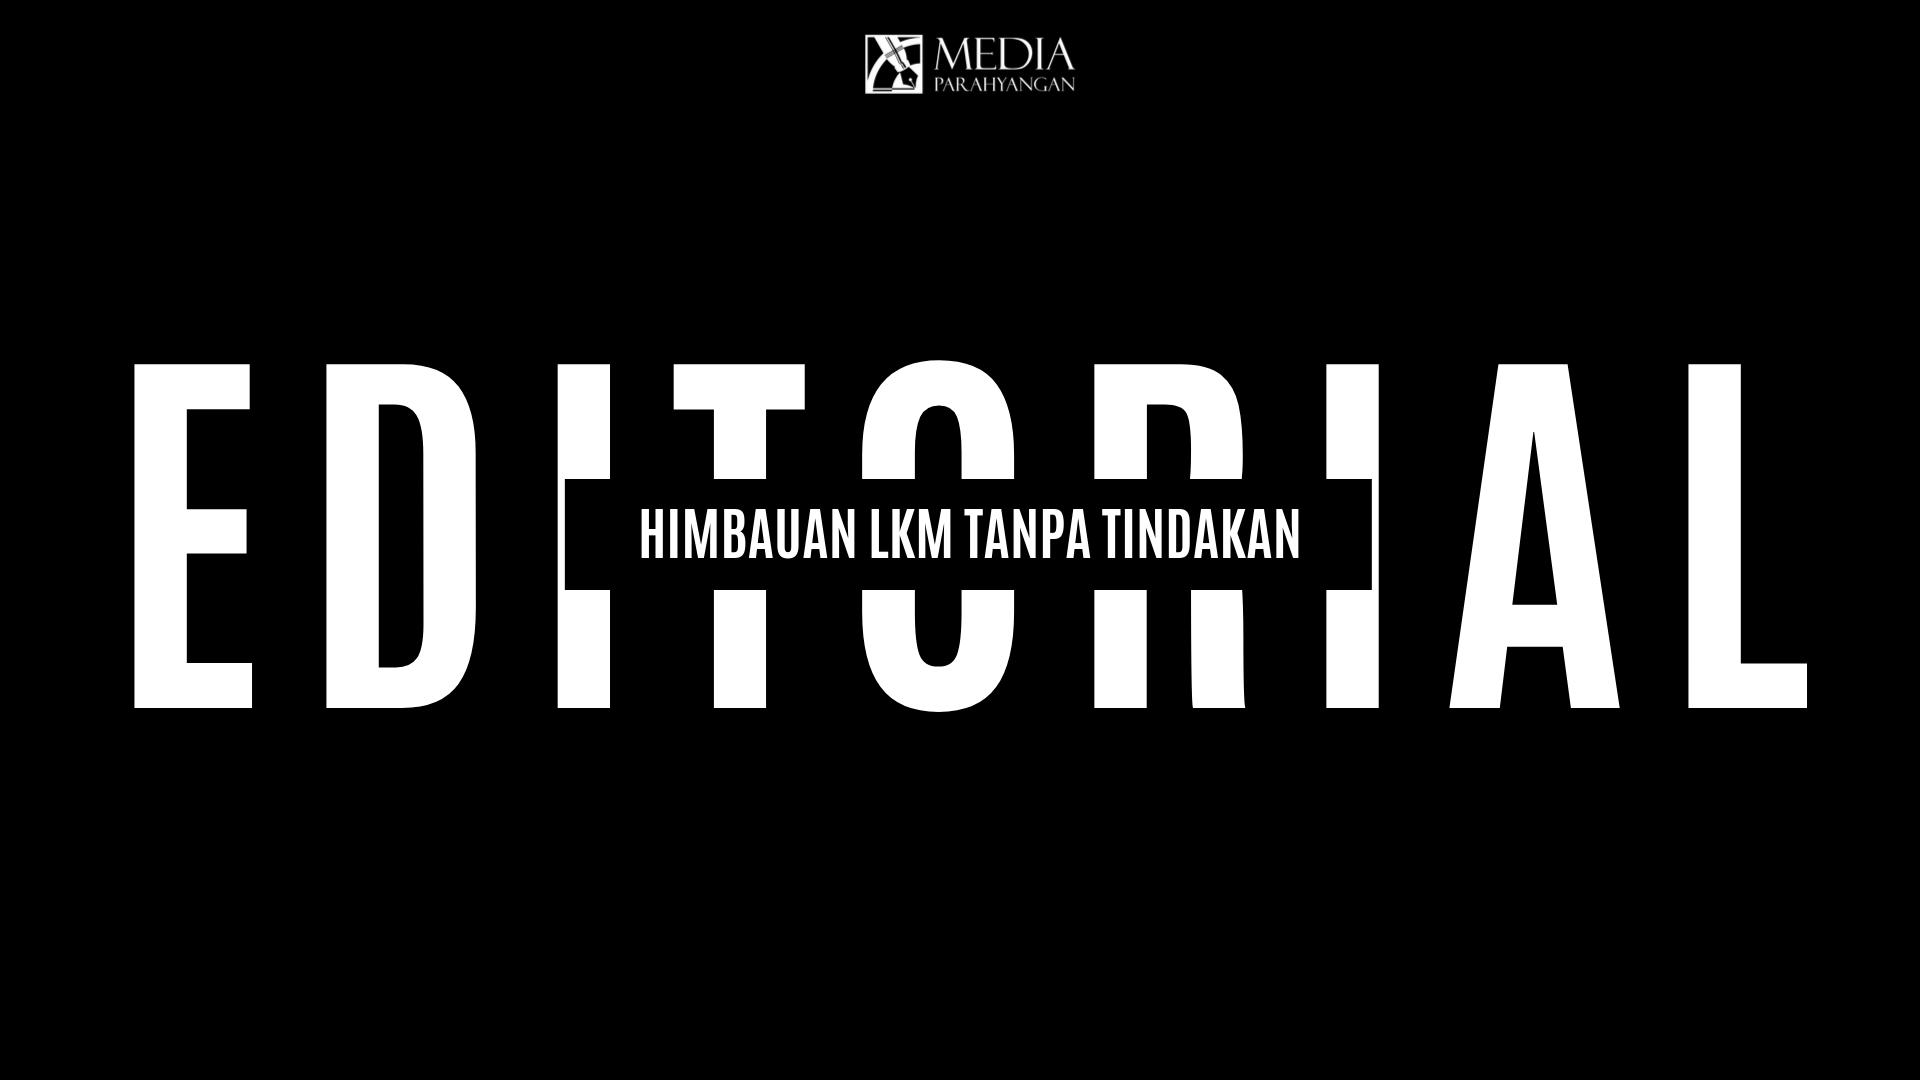 Editorial: Himbauan LKM Tanpa Tindakan